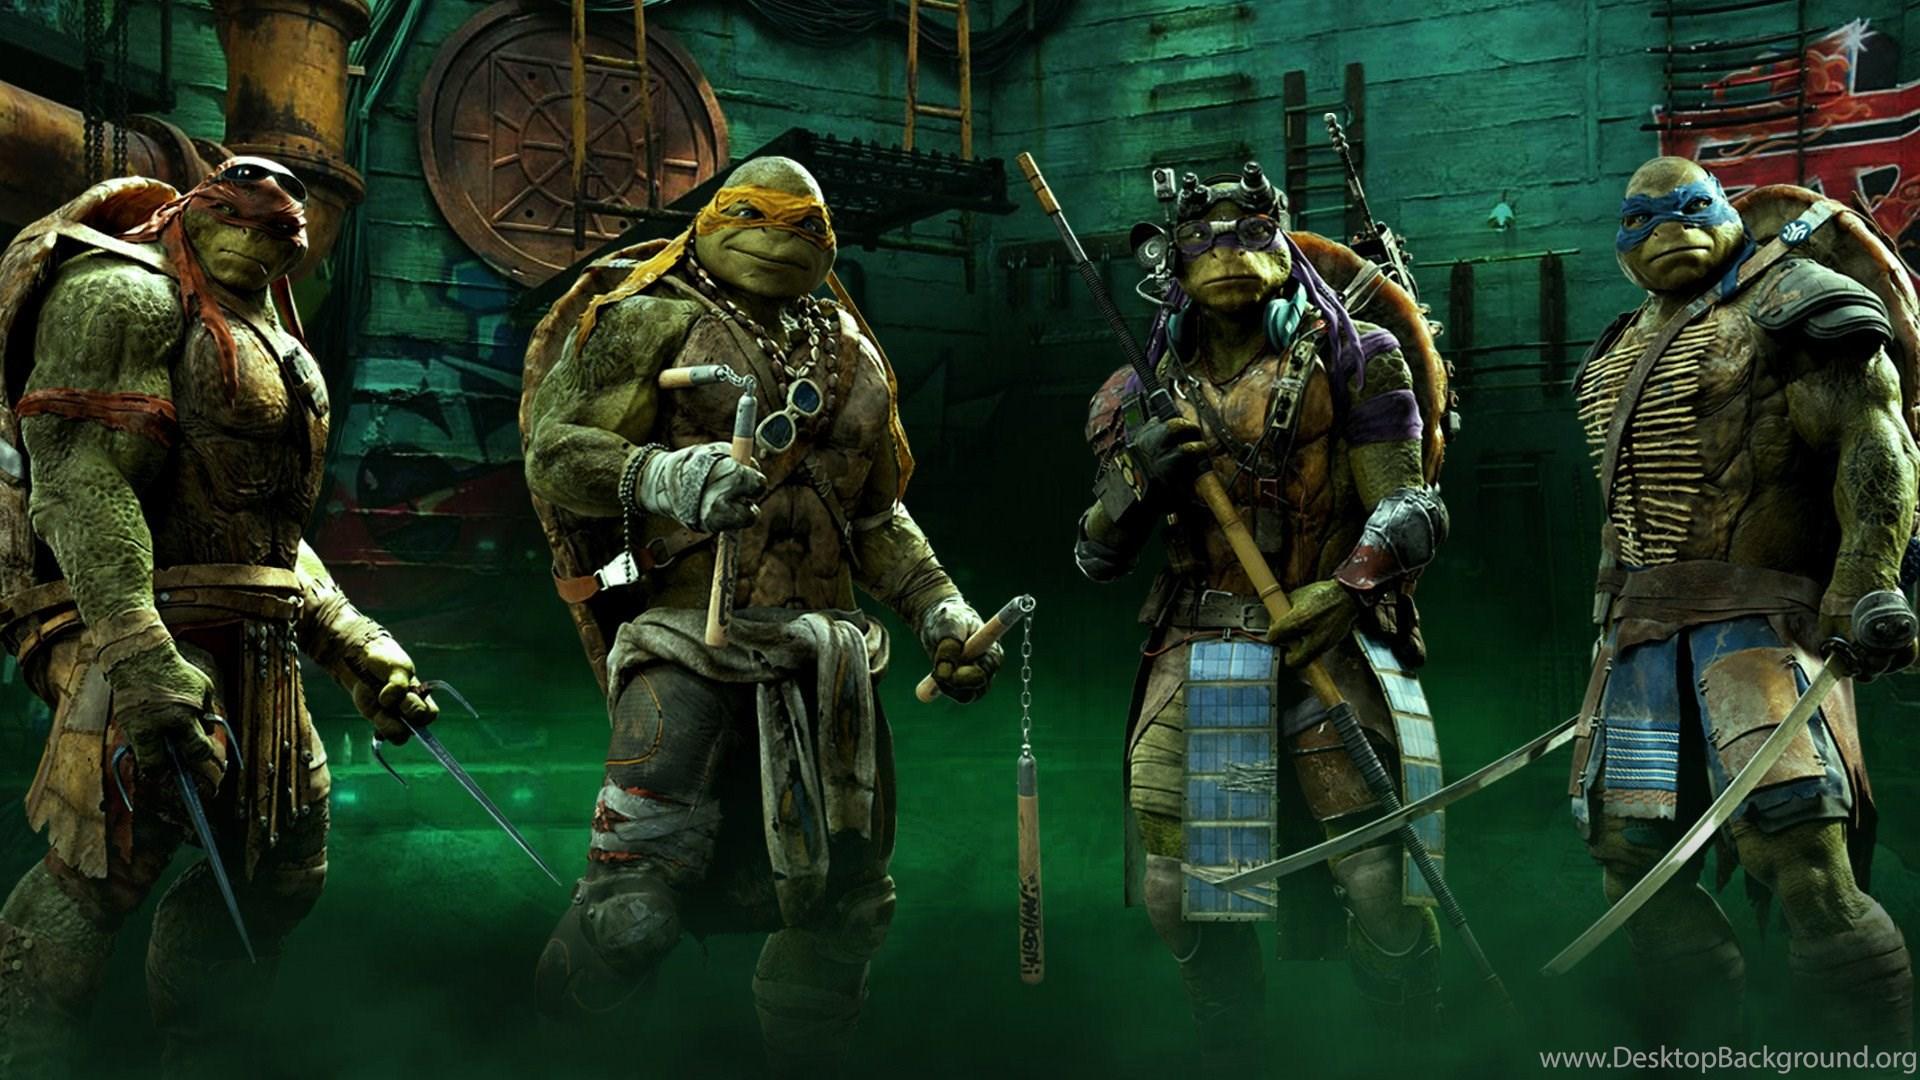 High Resolution Teenage Mutant Ninja Turtles Wallpapers Hd 1080p